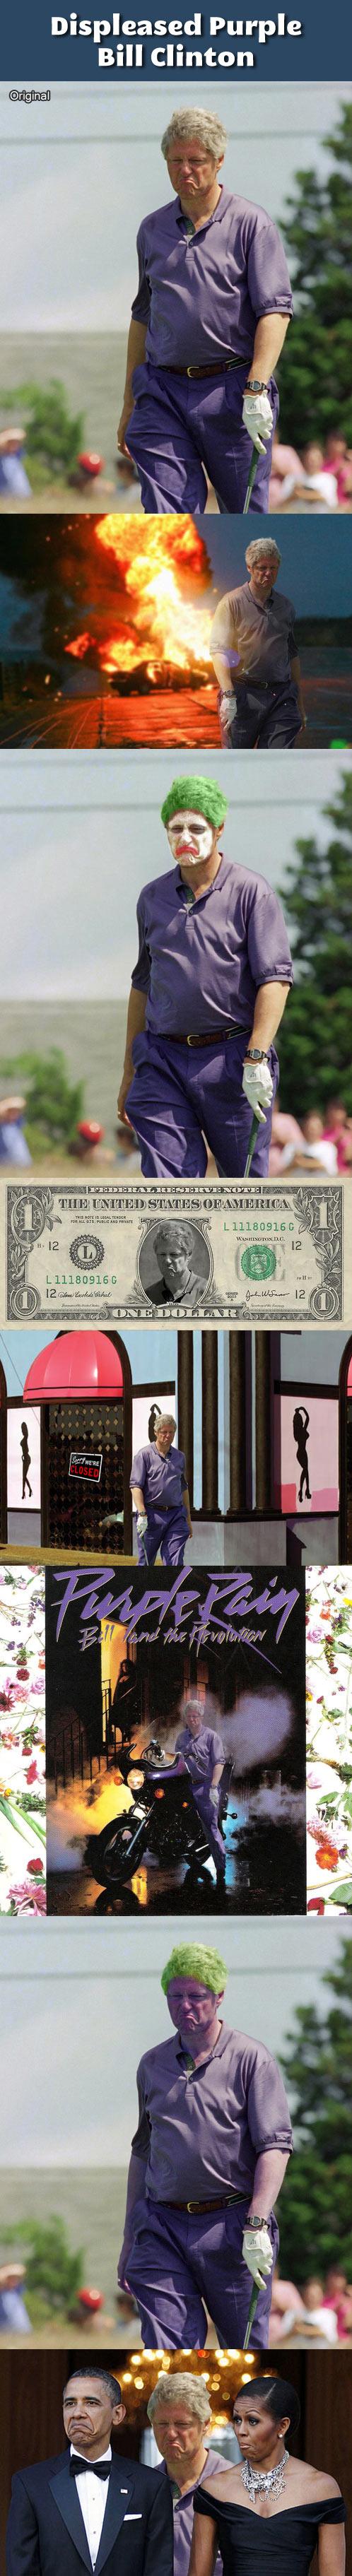 funny-Bill-Clinton-Photoshop-purple